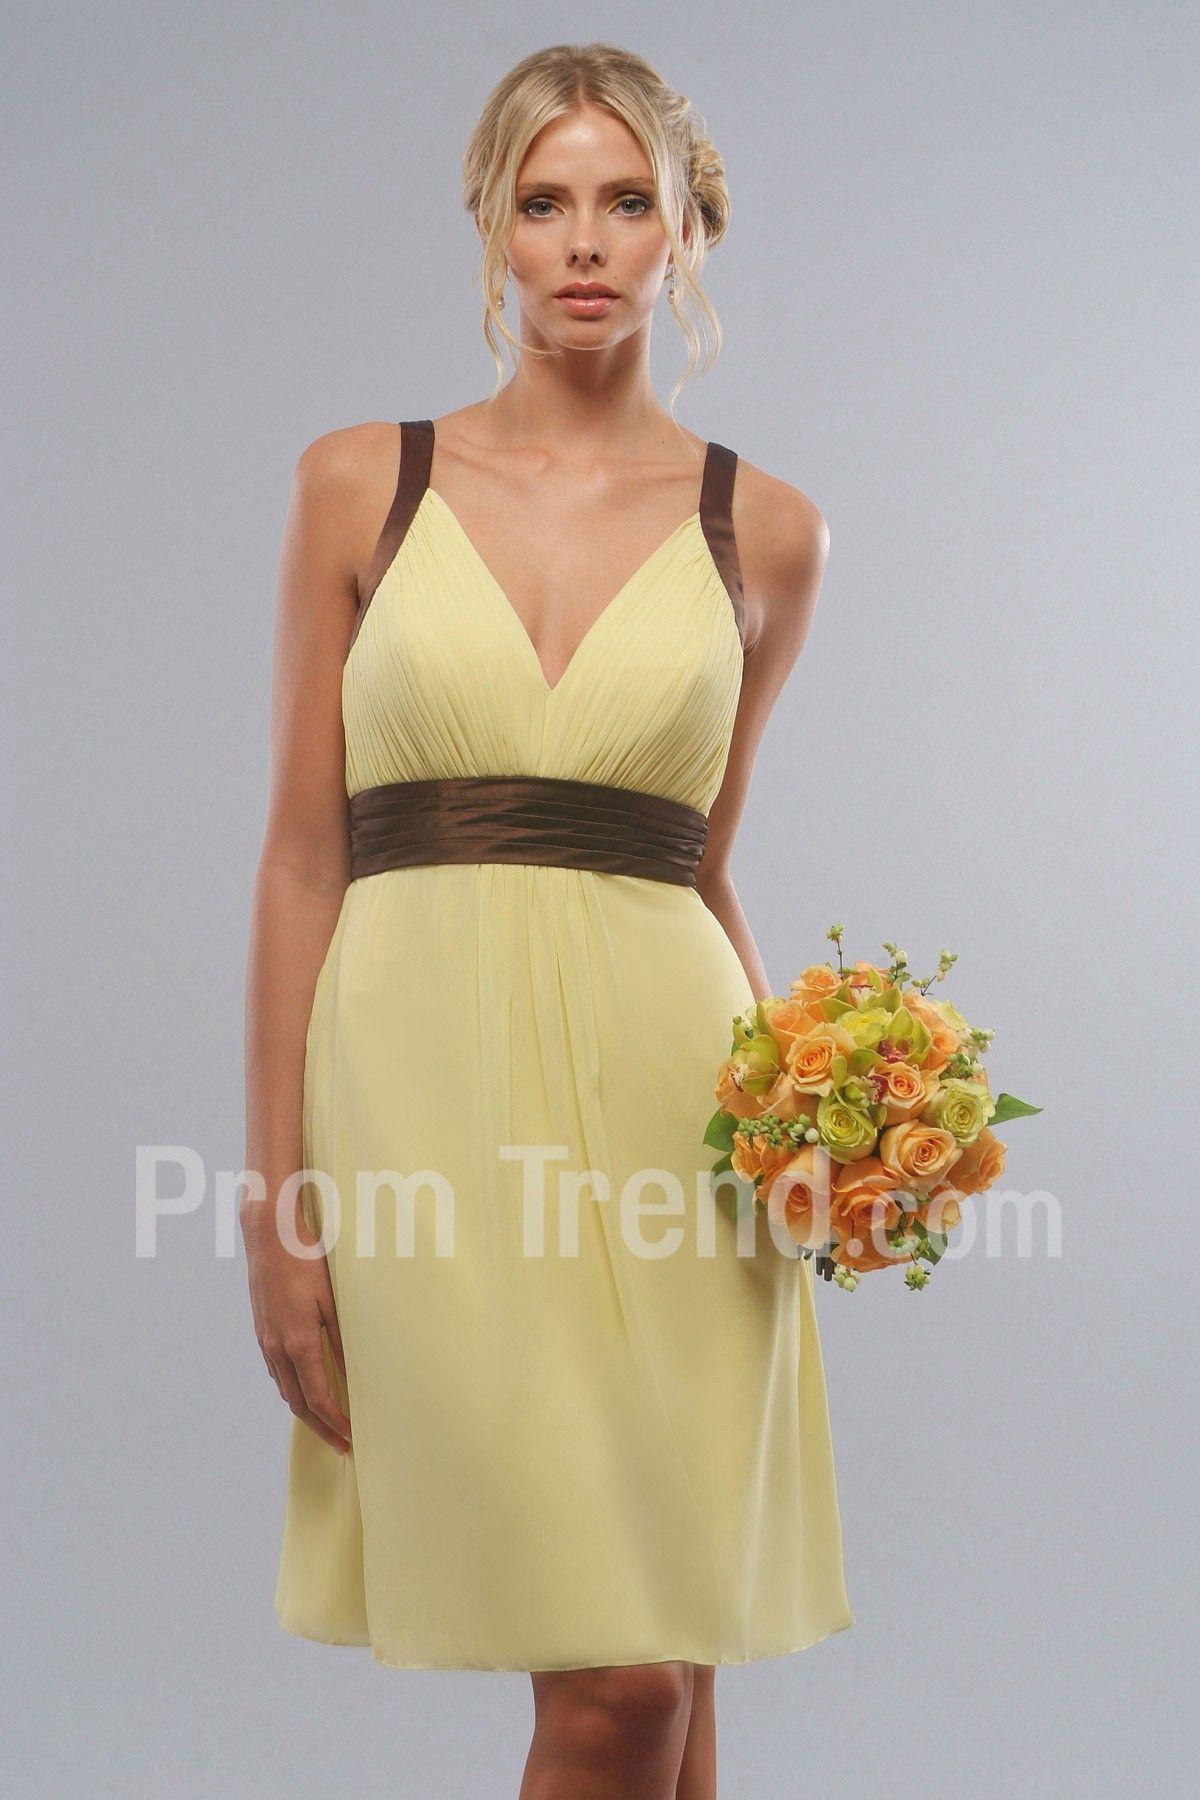 Aline vneckline short chiffoncharmeuse prom dress promtrend